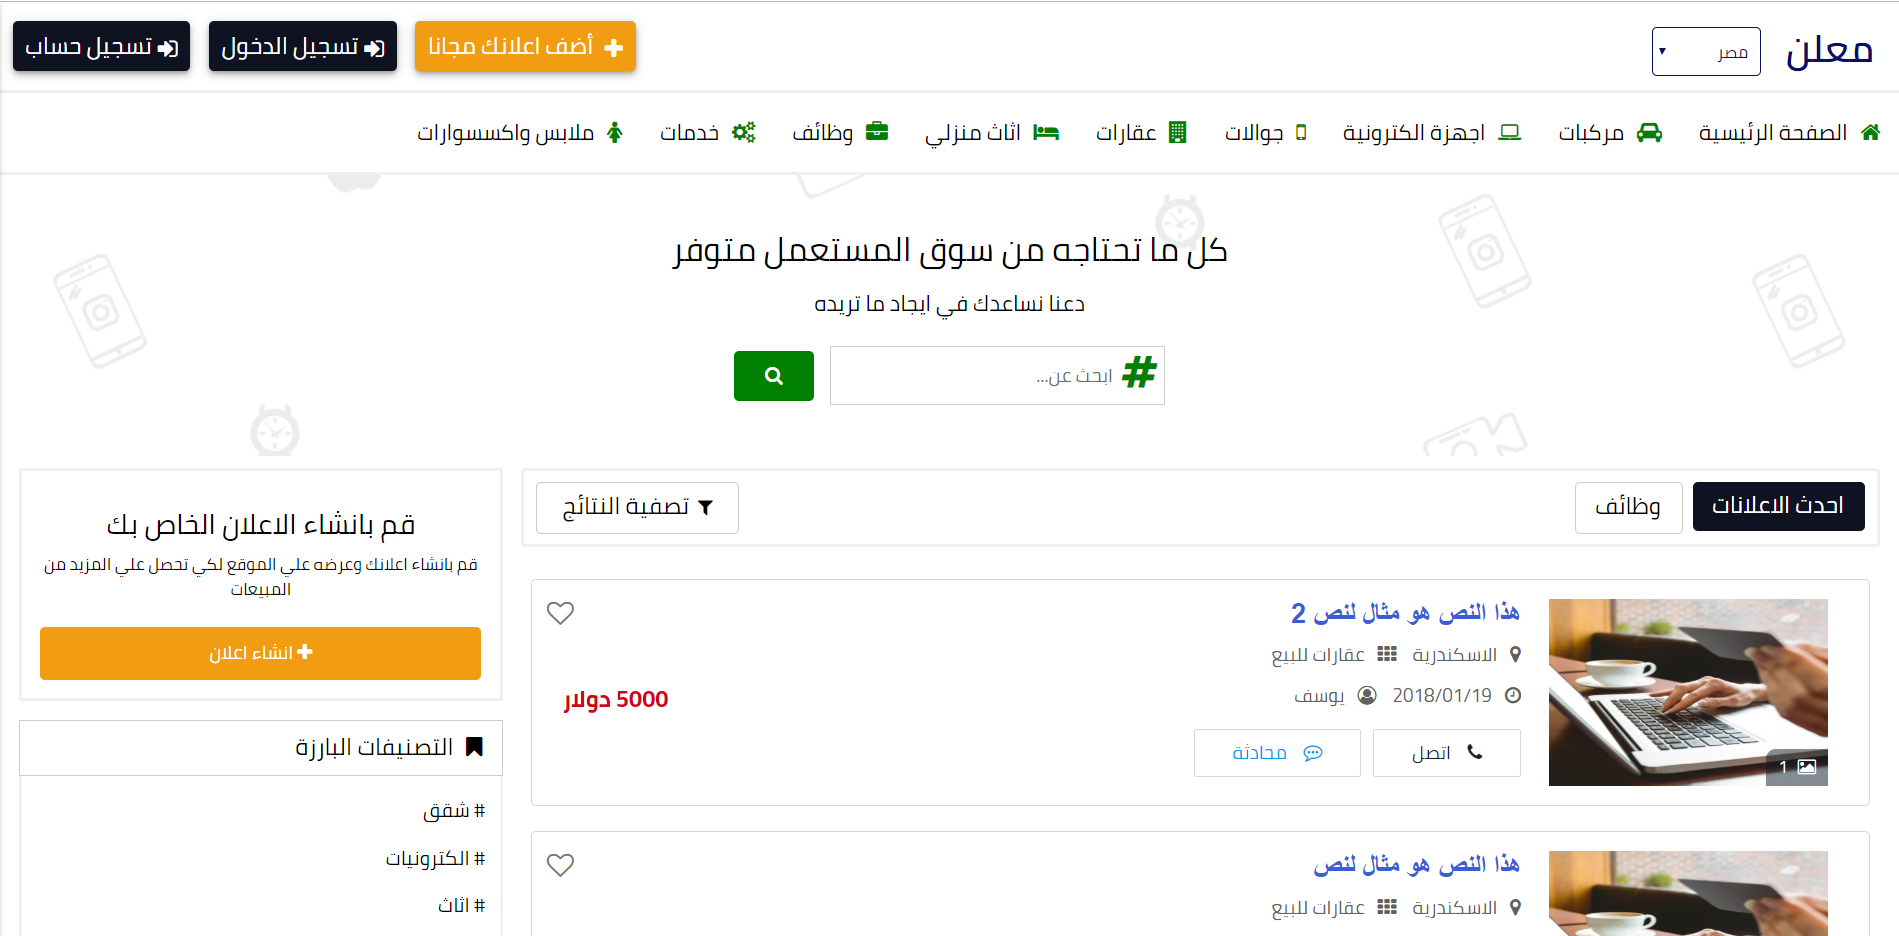 Moalen | Classified Ads PHP Script